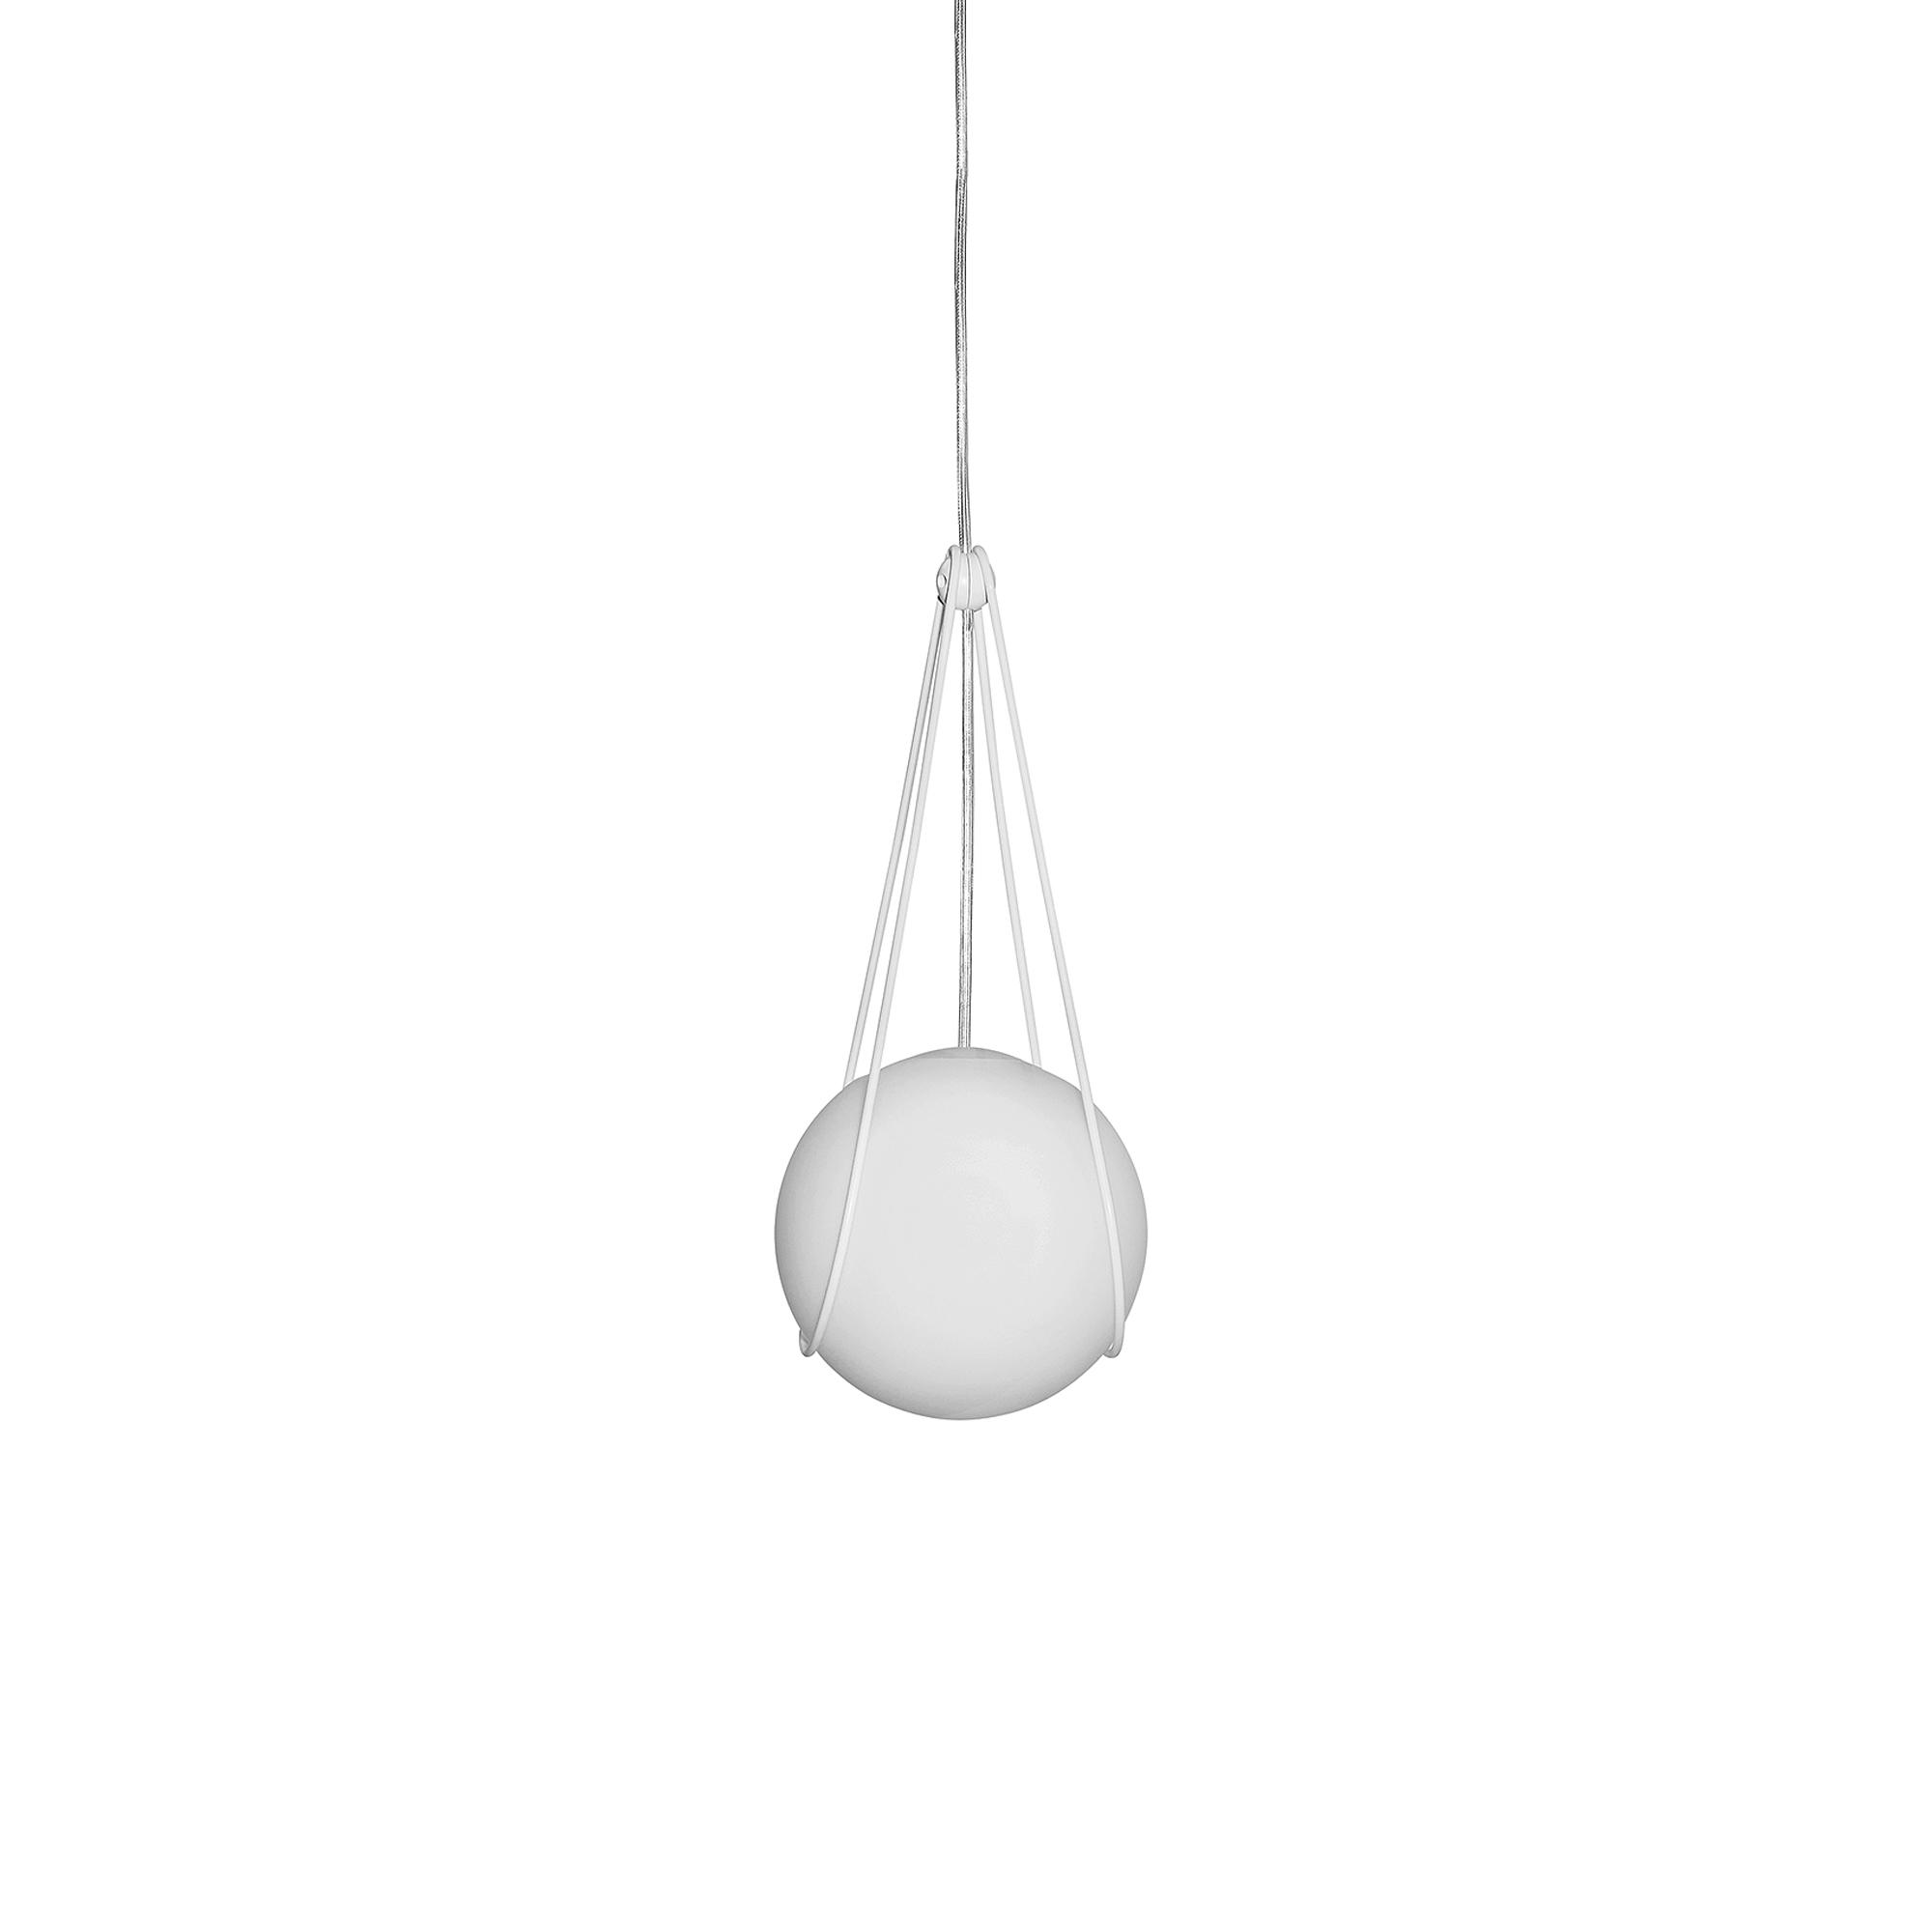 Design House Stockholm Lamphållare Kosmos 160mm vit